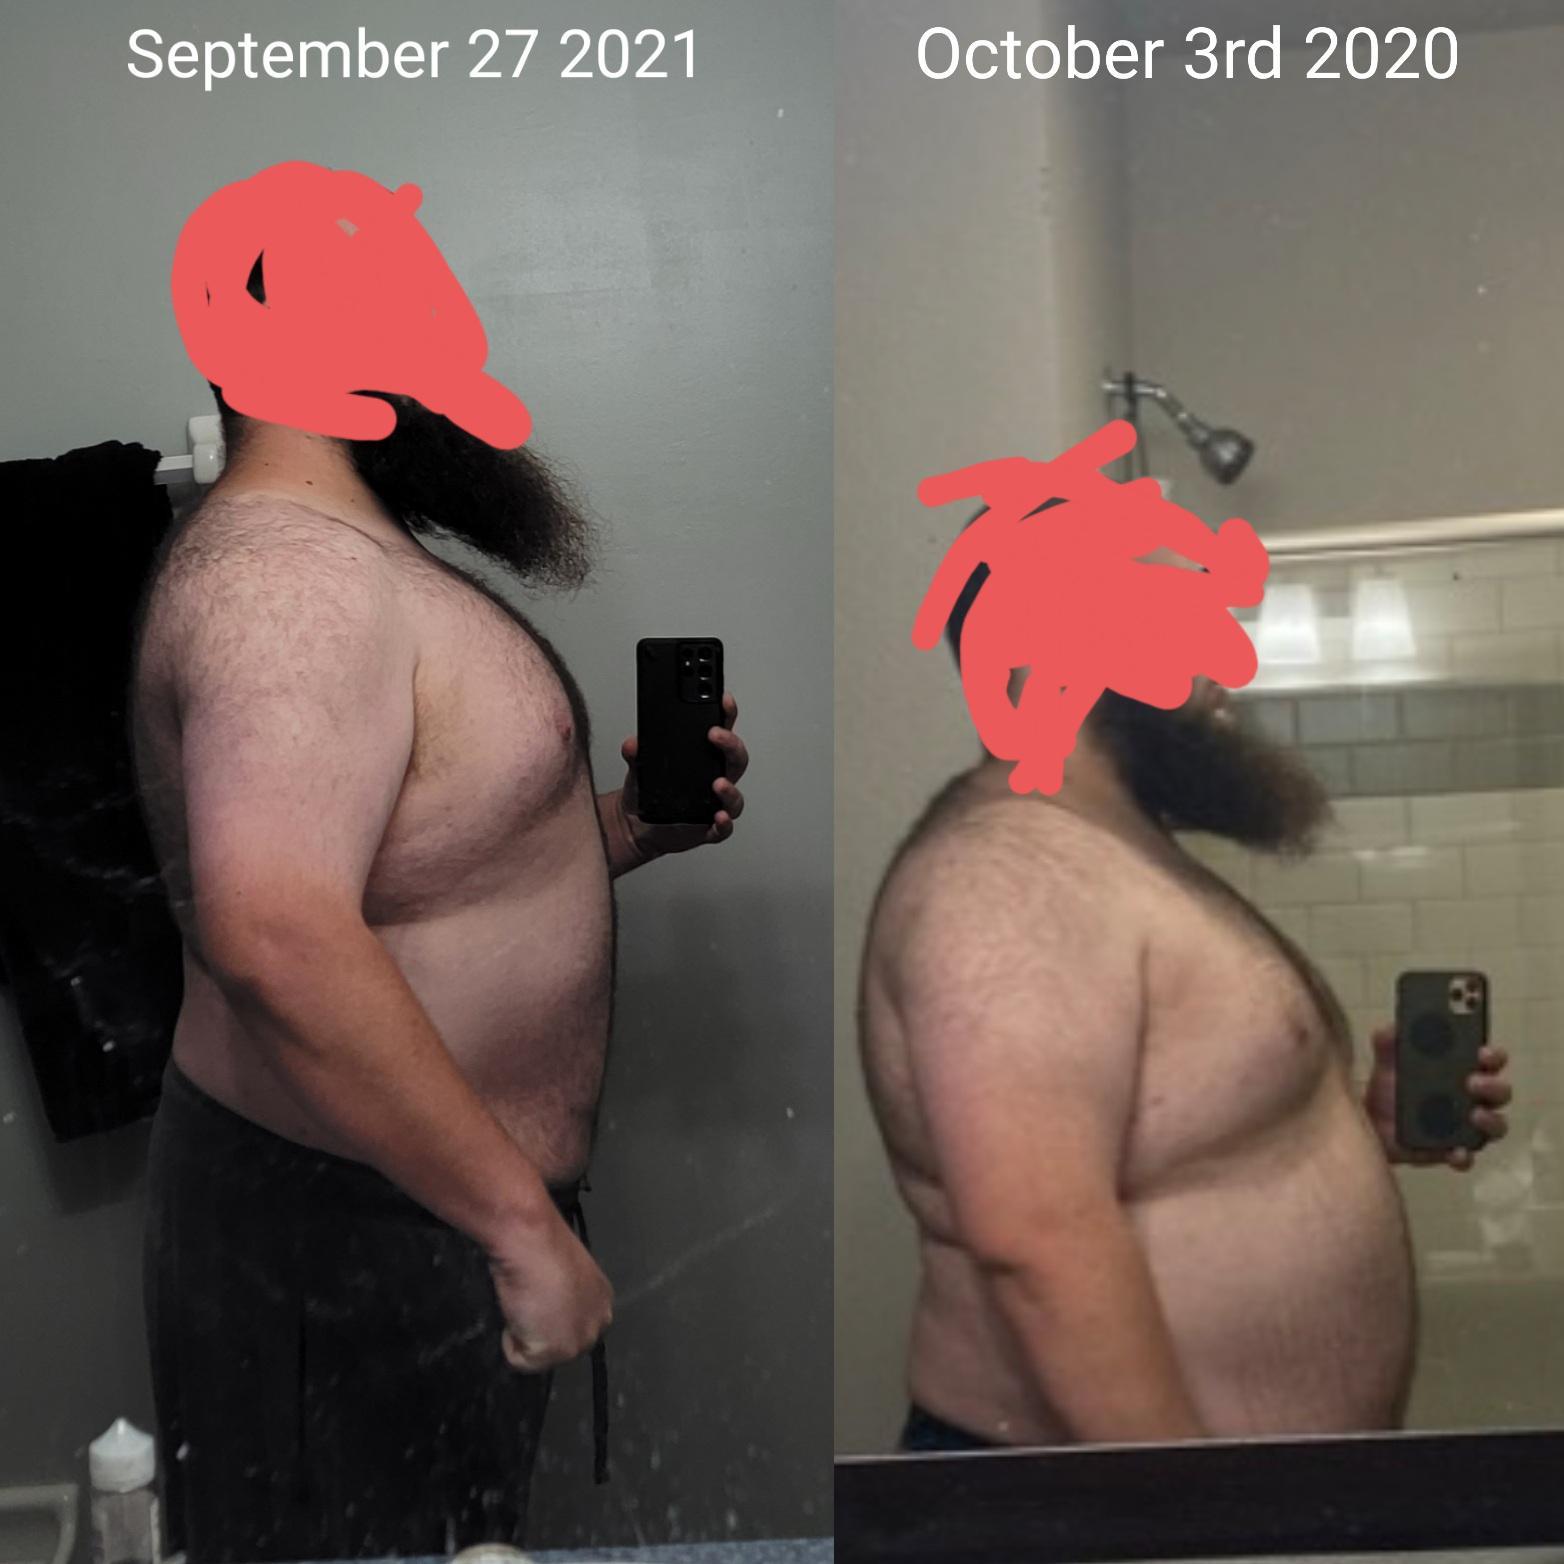 Progress Pics of 60 lbs Weight Loss 6'1 Male 350 lbs to 290 lbs